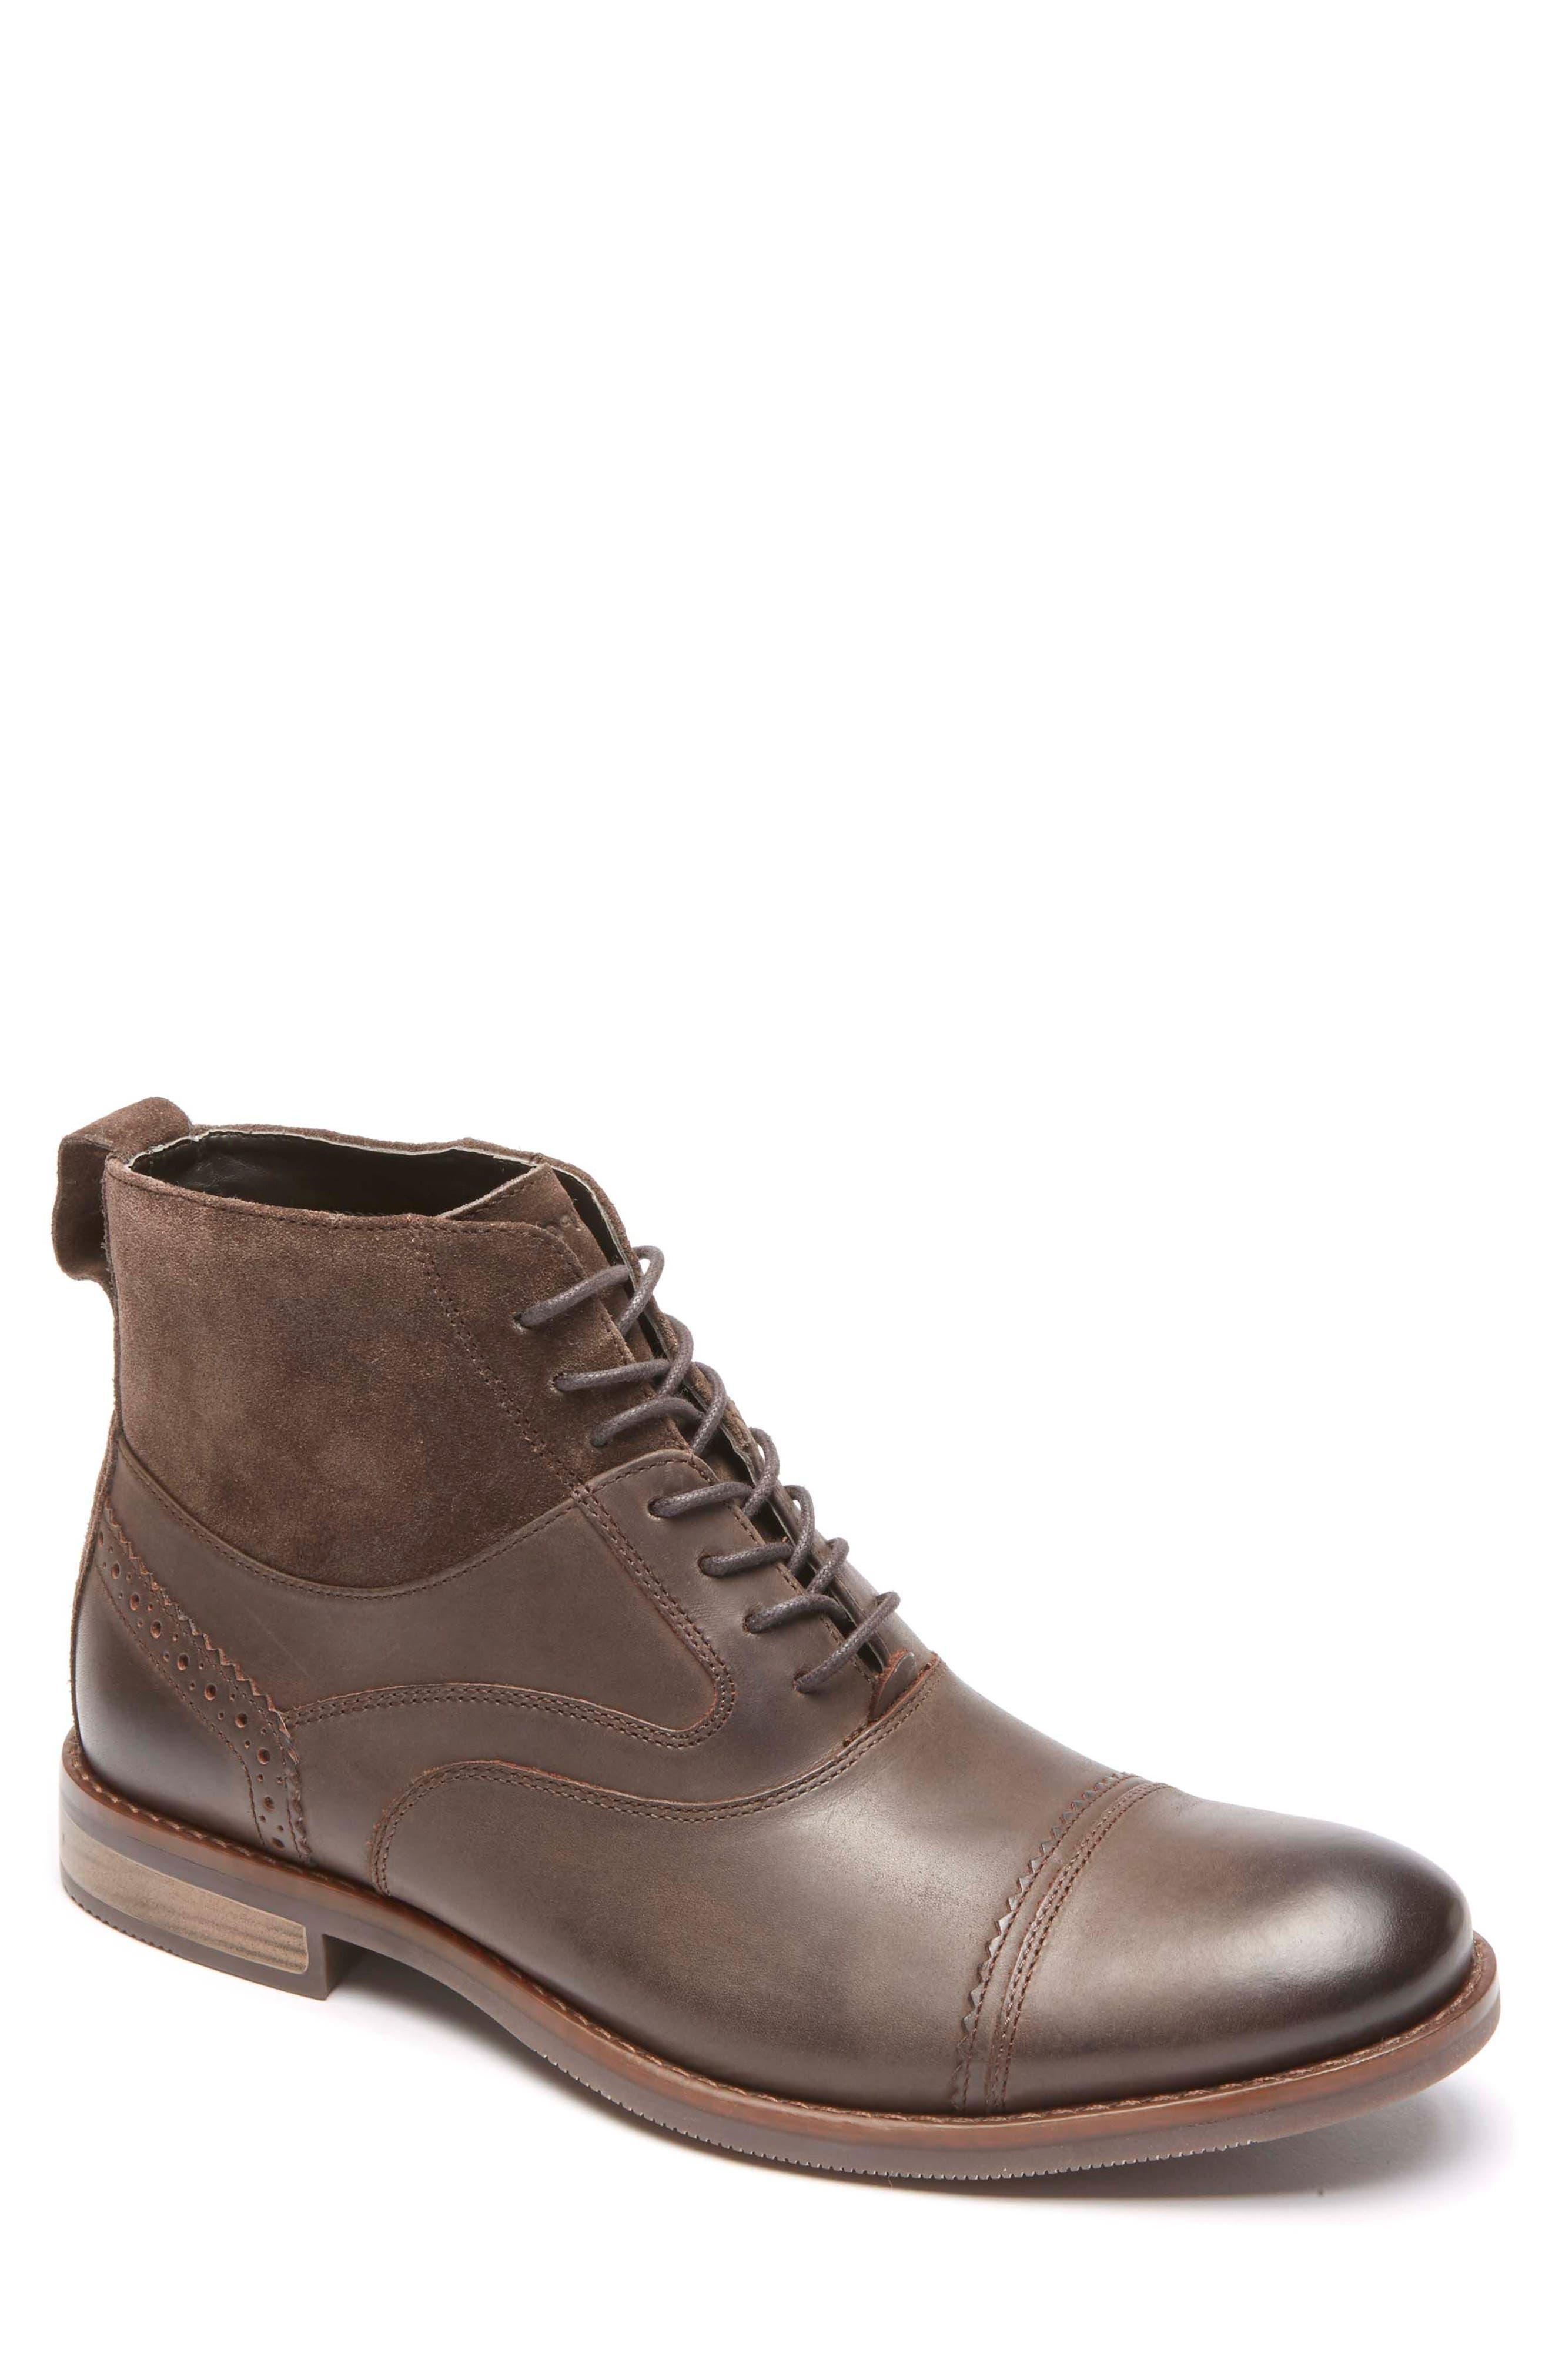 Wynstin Cap Toe Boot,                         Main,                         color, Dark Chocolate Leather